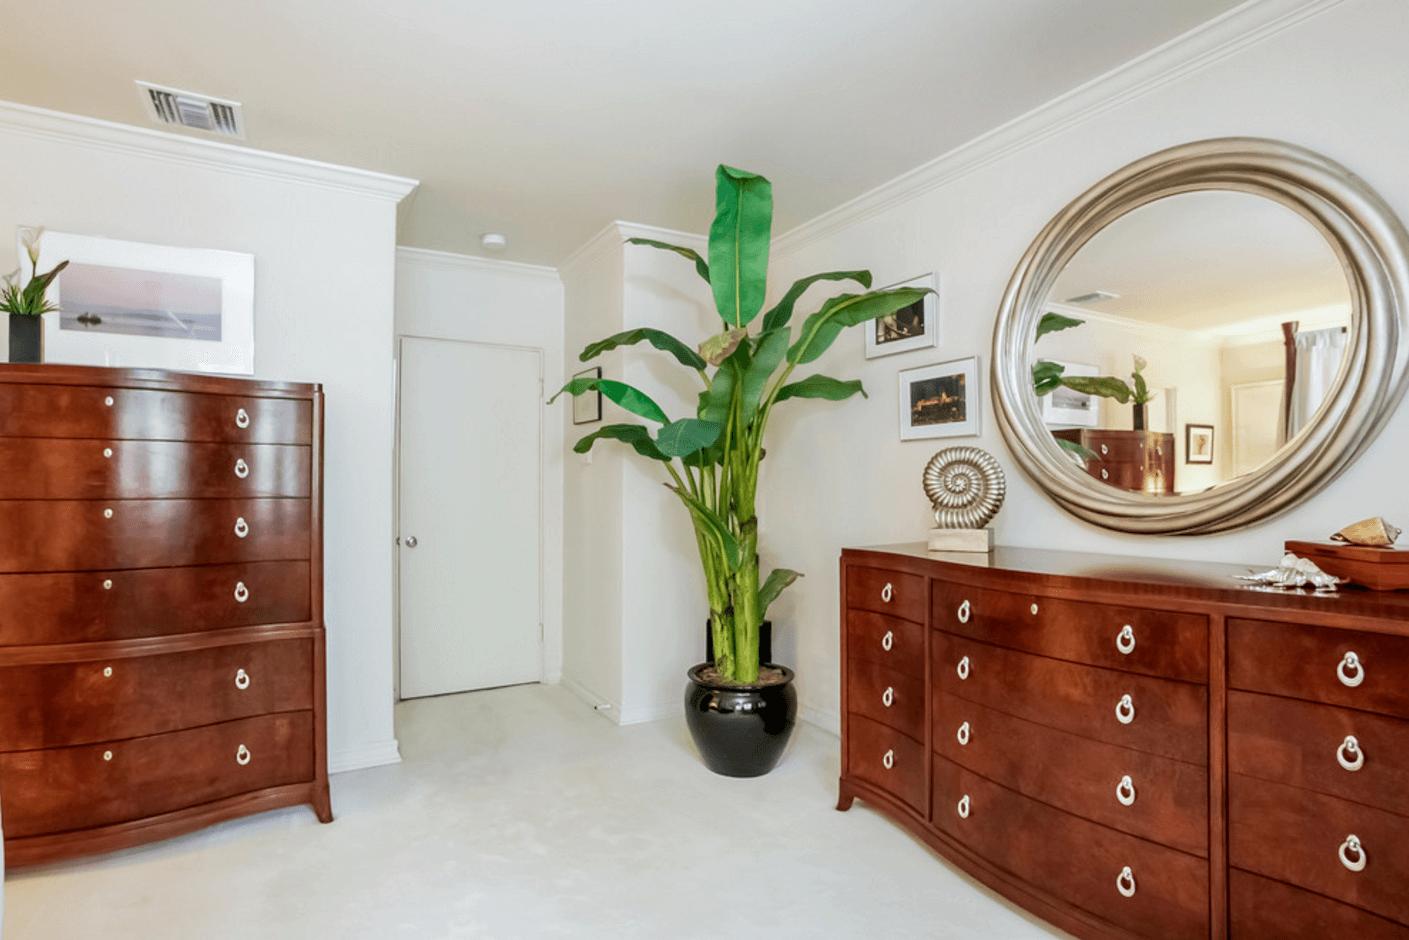 La Canada Bedroom Remodel